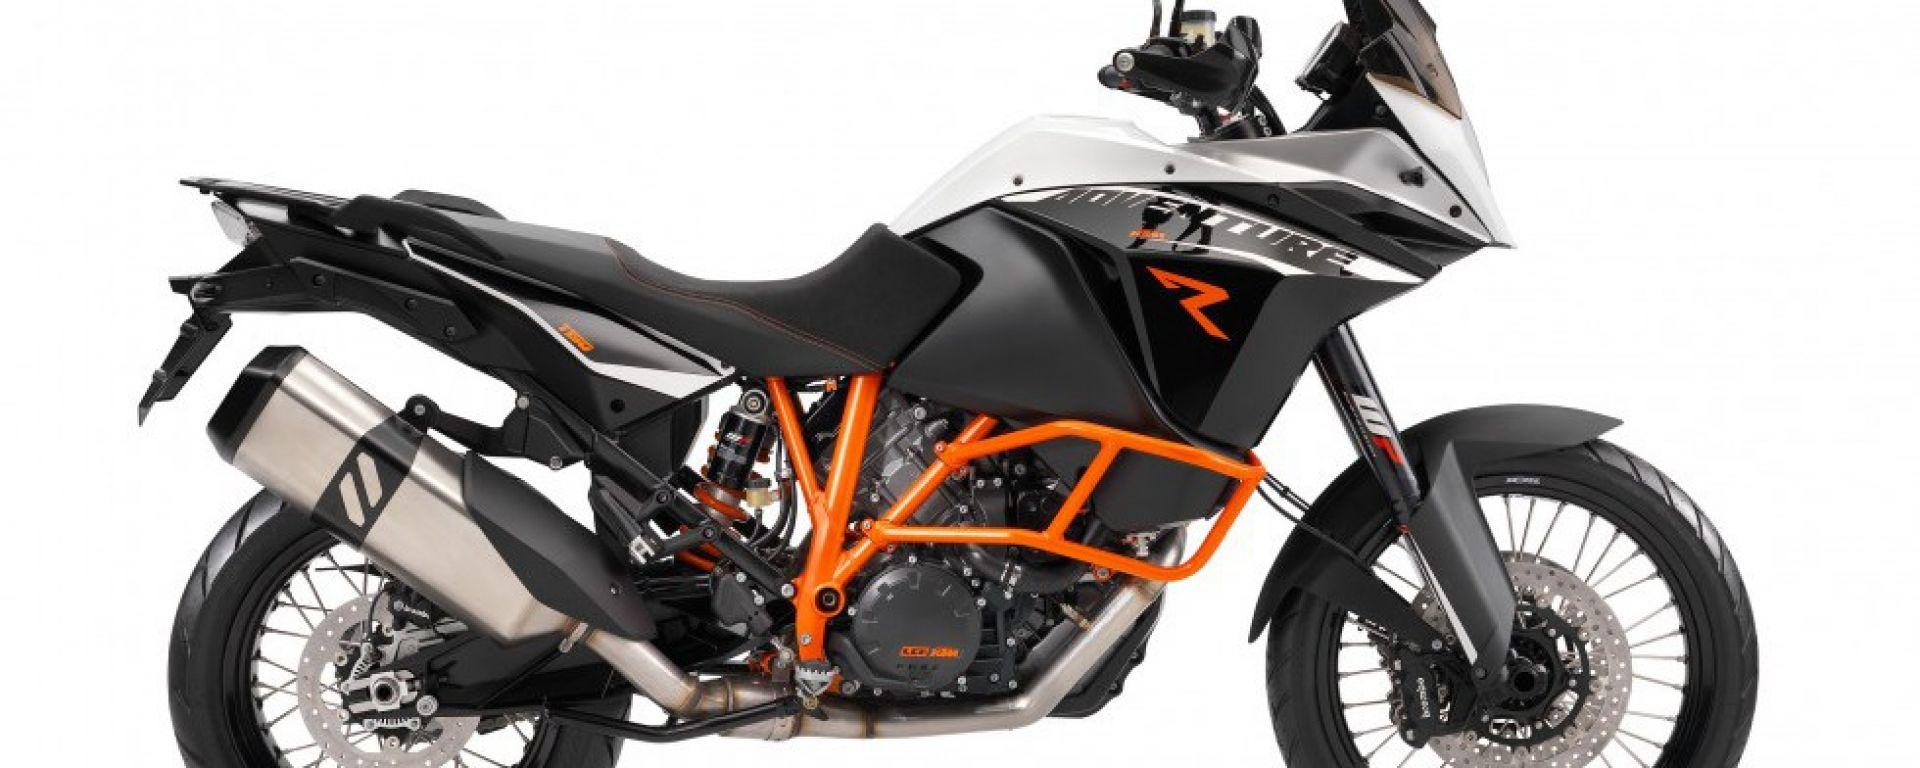 KTM 1190 Adventure: un nuovo promo video